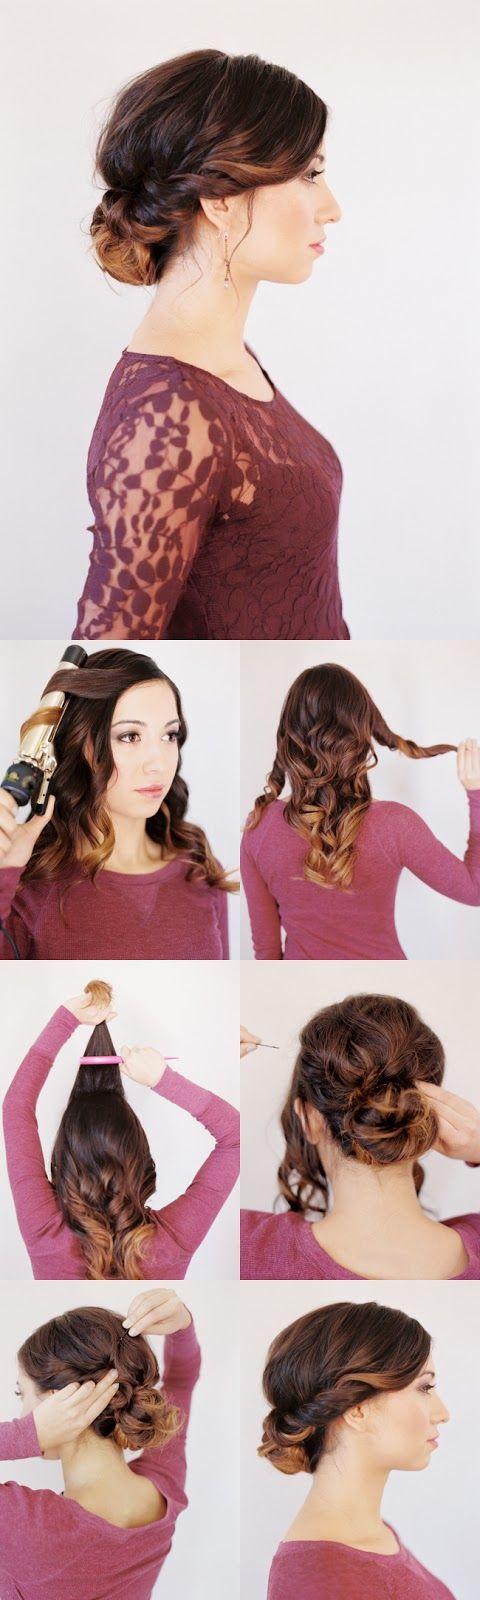 Amanda Paige has moved!: Loose Updo Hair Tutorial